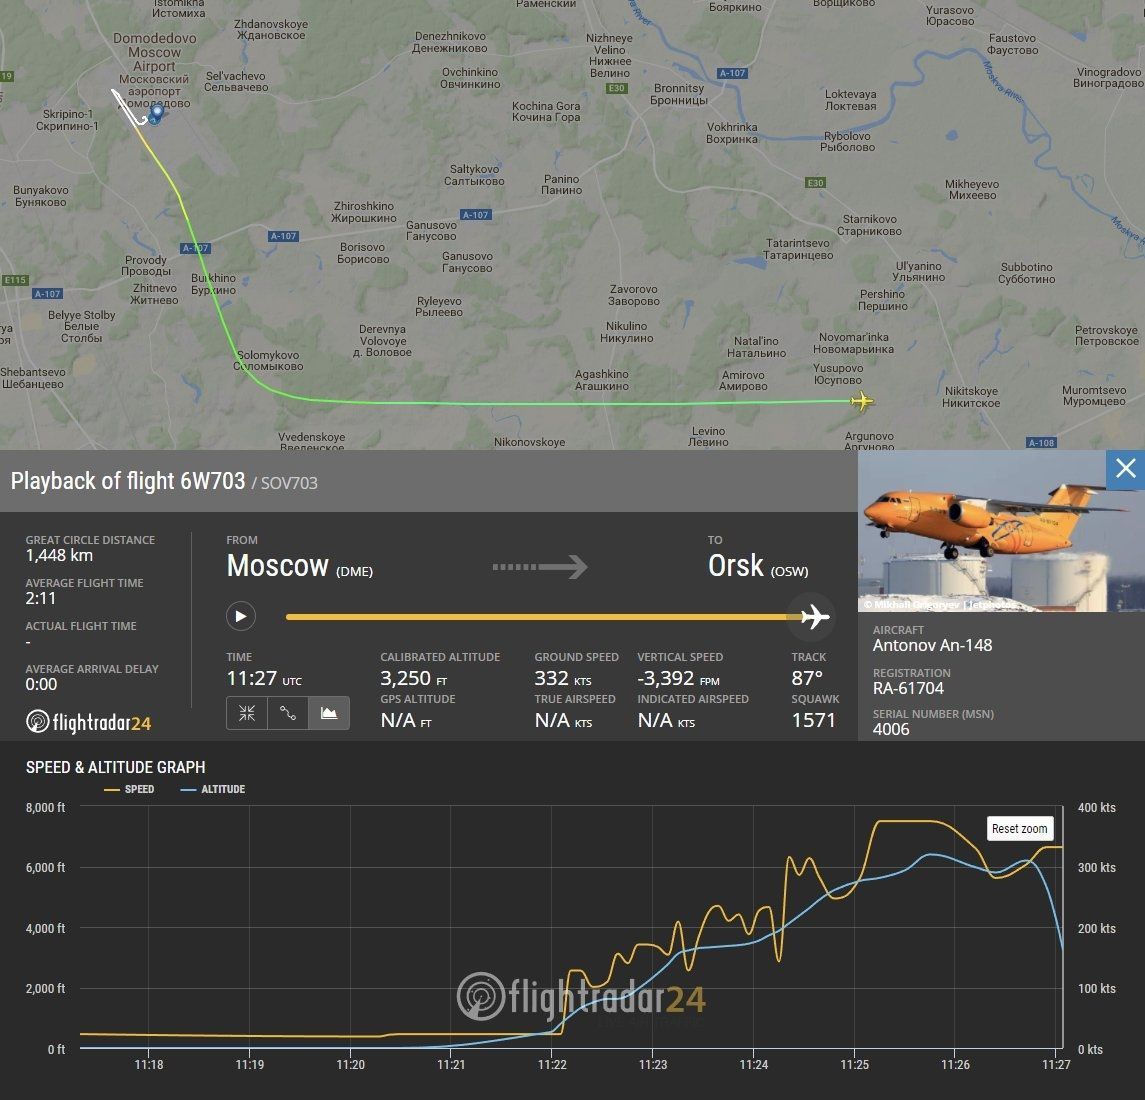 6W703次航班的速度与高度图显示,飞机ADS-B信号在于莫斯科多莫杰多沃机场东南方向大约20公里处消失之前的最后一分钟里,从6200英尺下降至3200英尺。